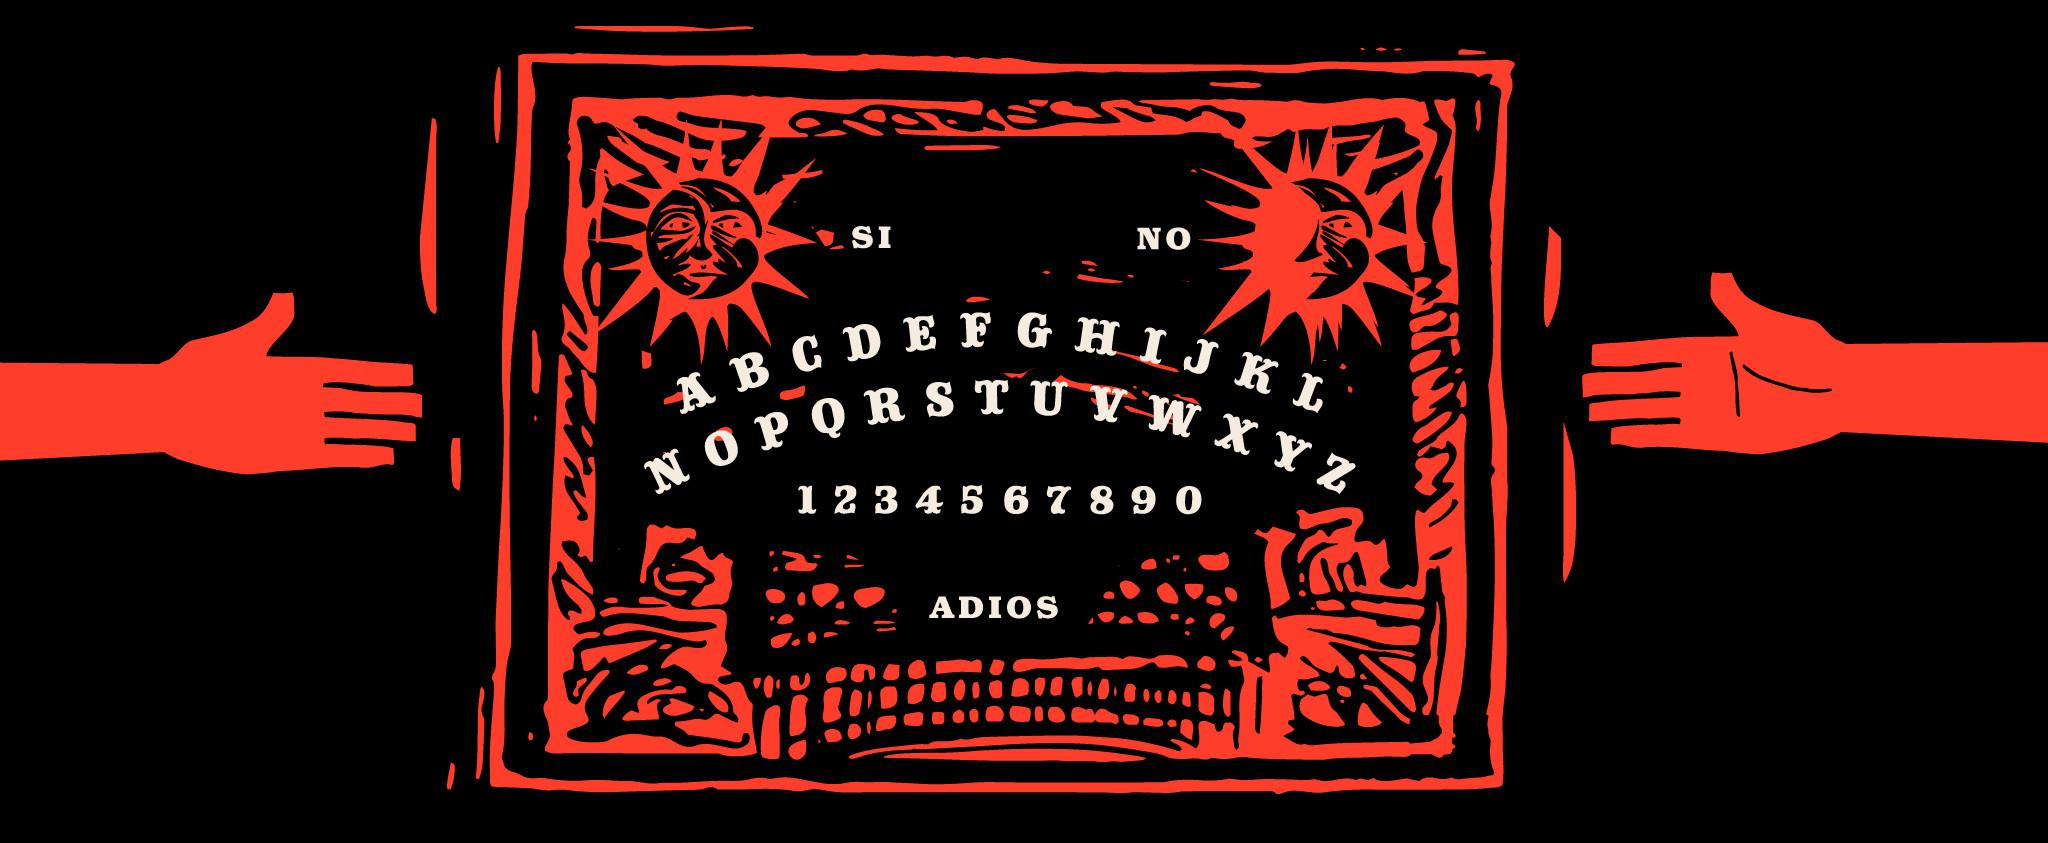 Illustration of a Ouija board.